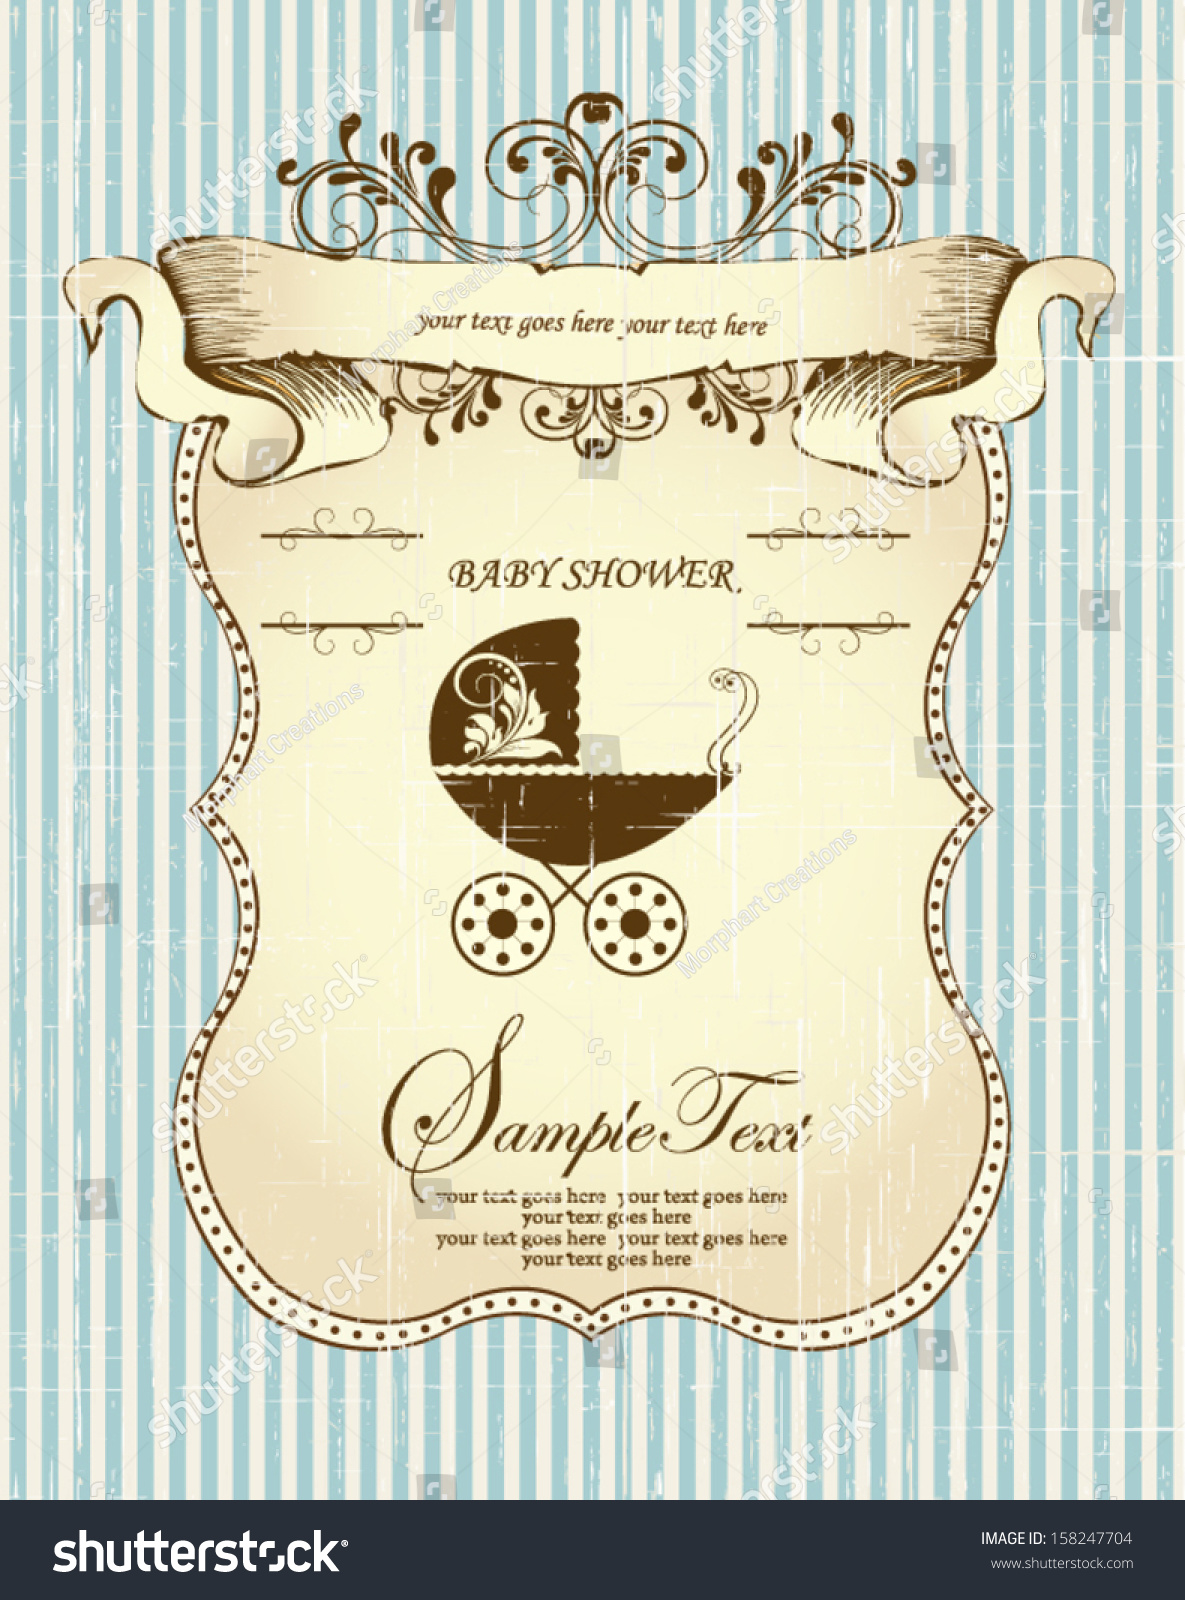 Vintage Baby Shower Announcement Card Vector 158247704 – Vintage Birth Announcement